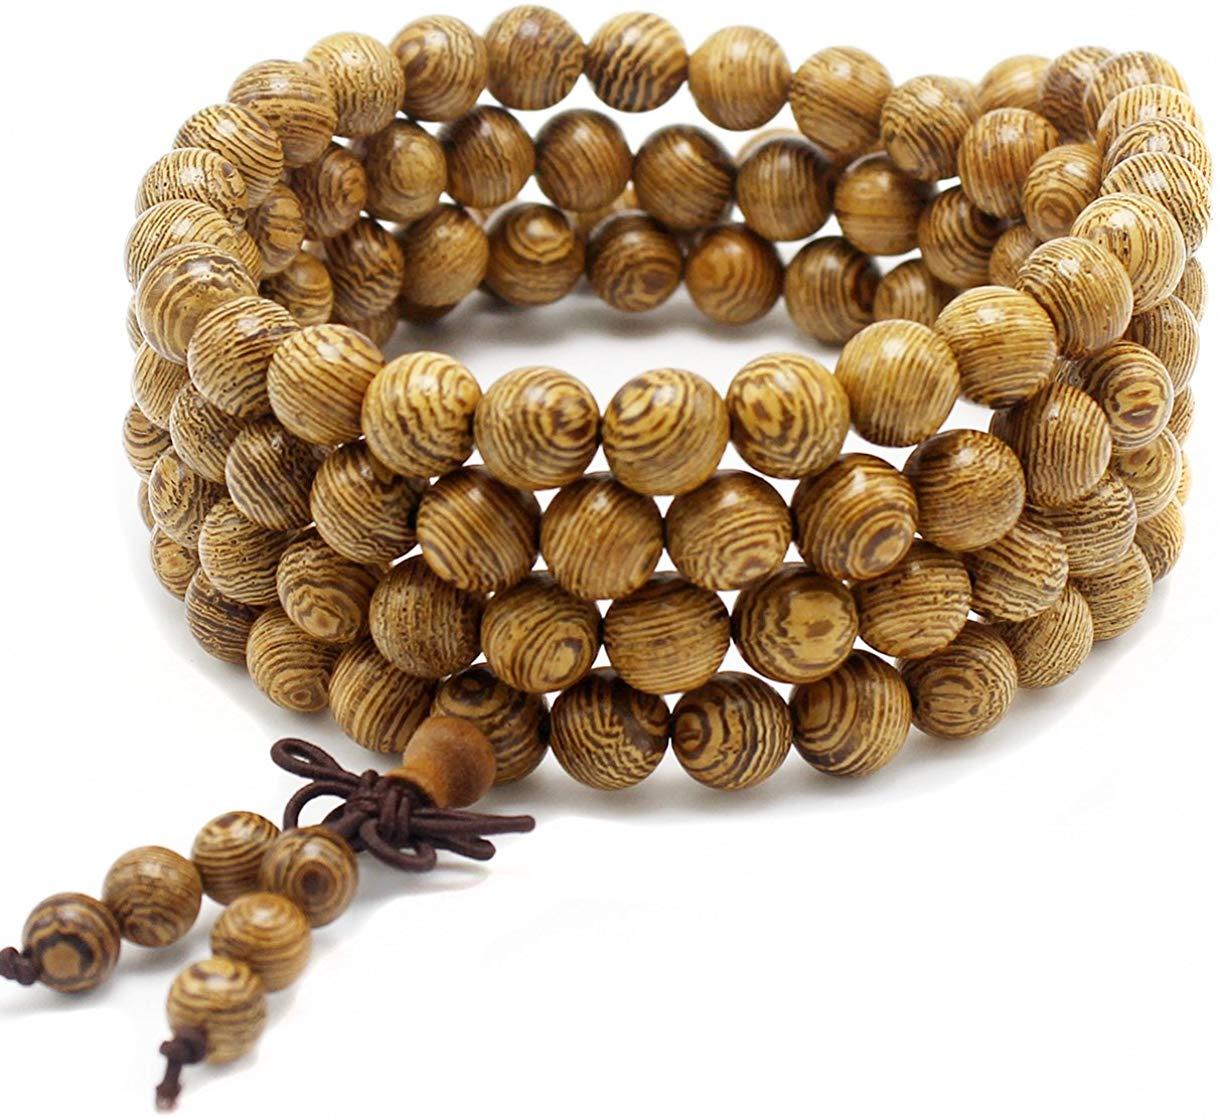 anzhongli Mala Beads Bracelet 108 8mm Prayer Meditation Sandalwood Elastic